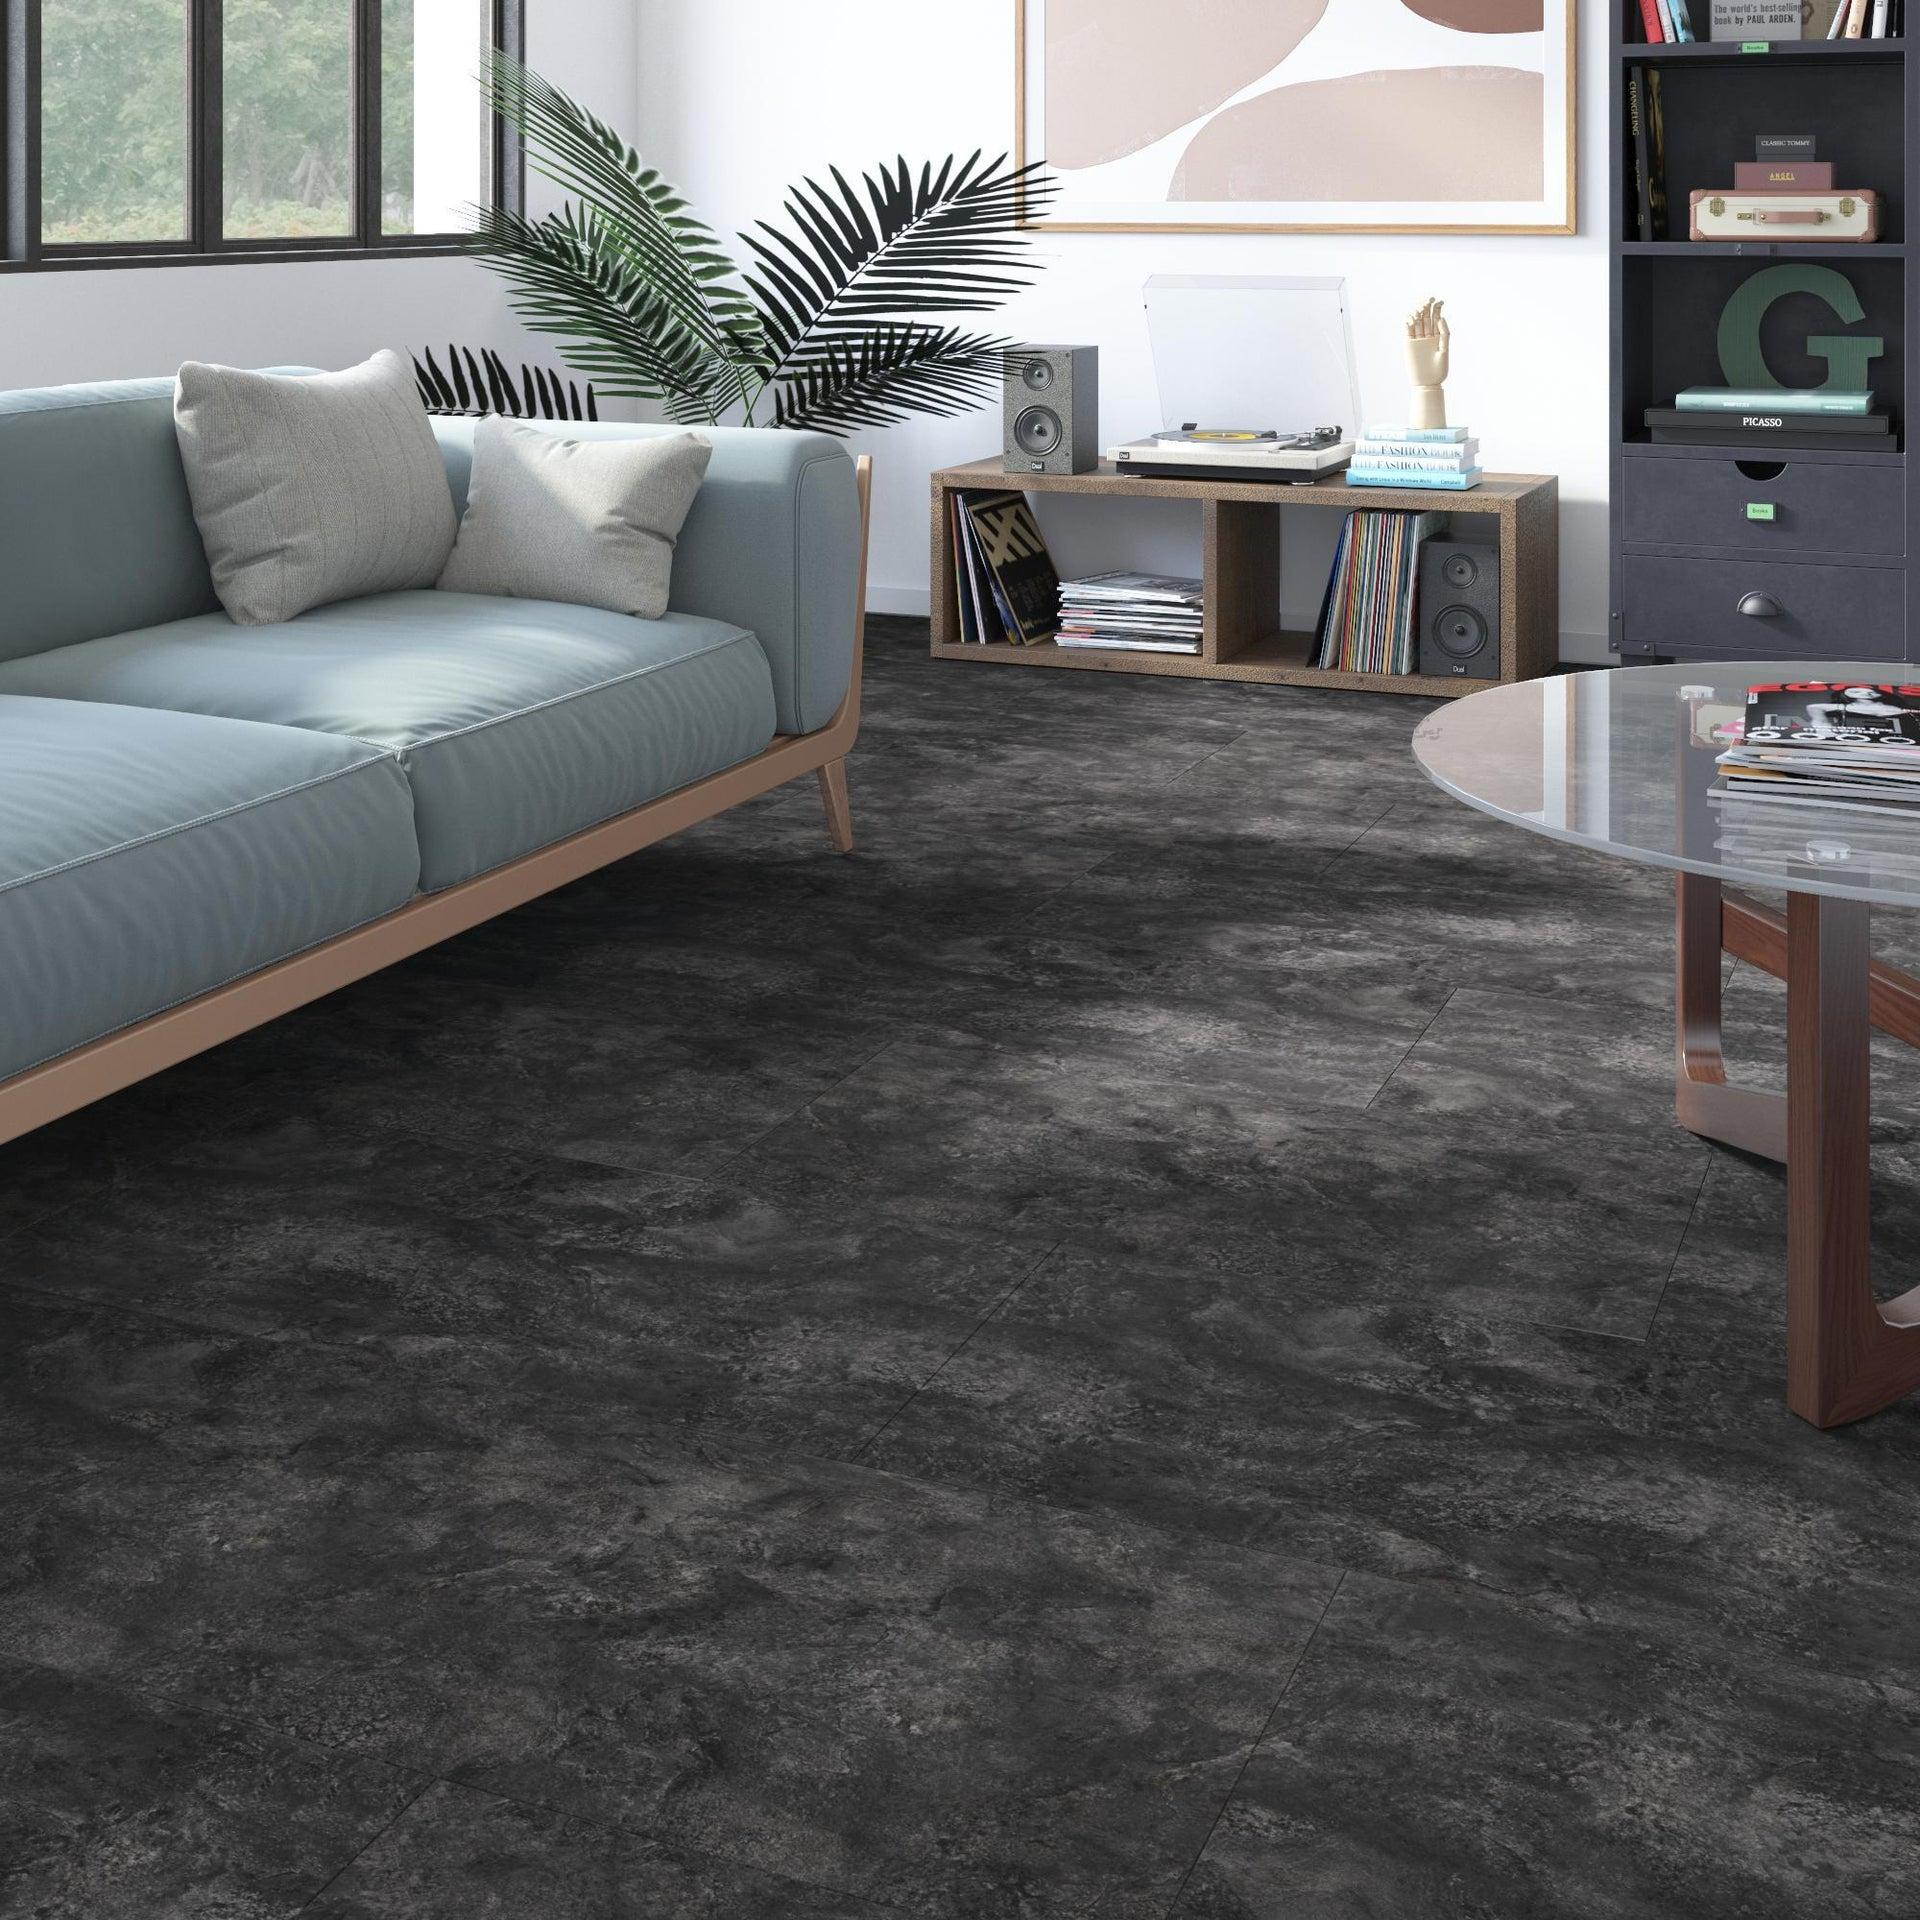 Pavimento PVC flottante clic+ Slate Sp 5 mm nero - 1